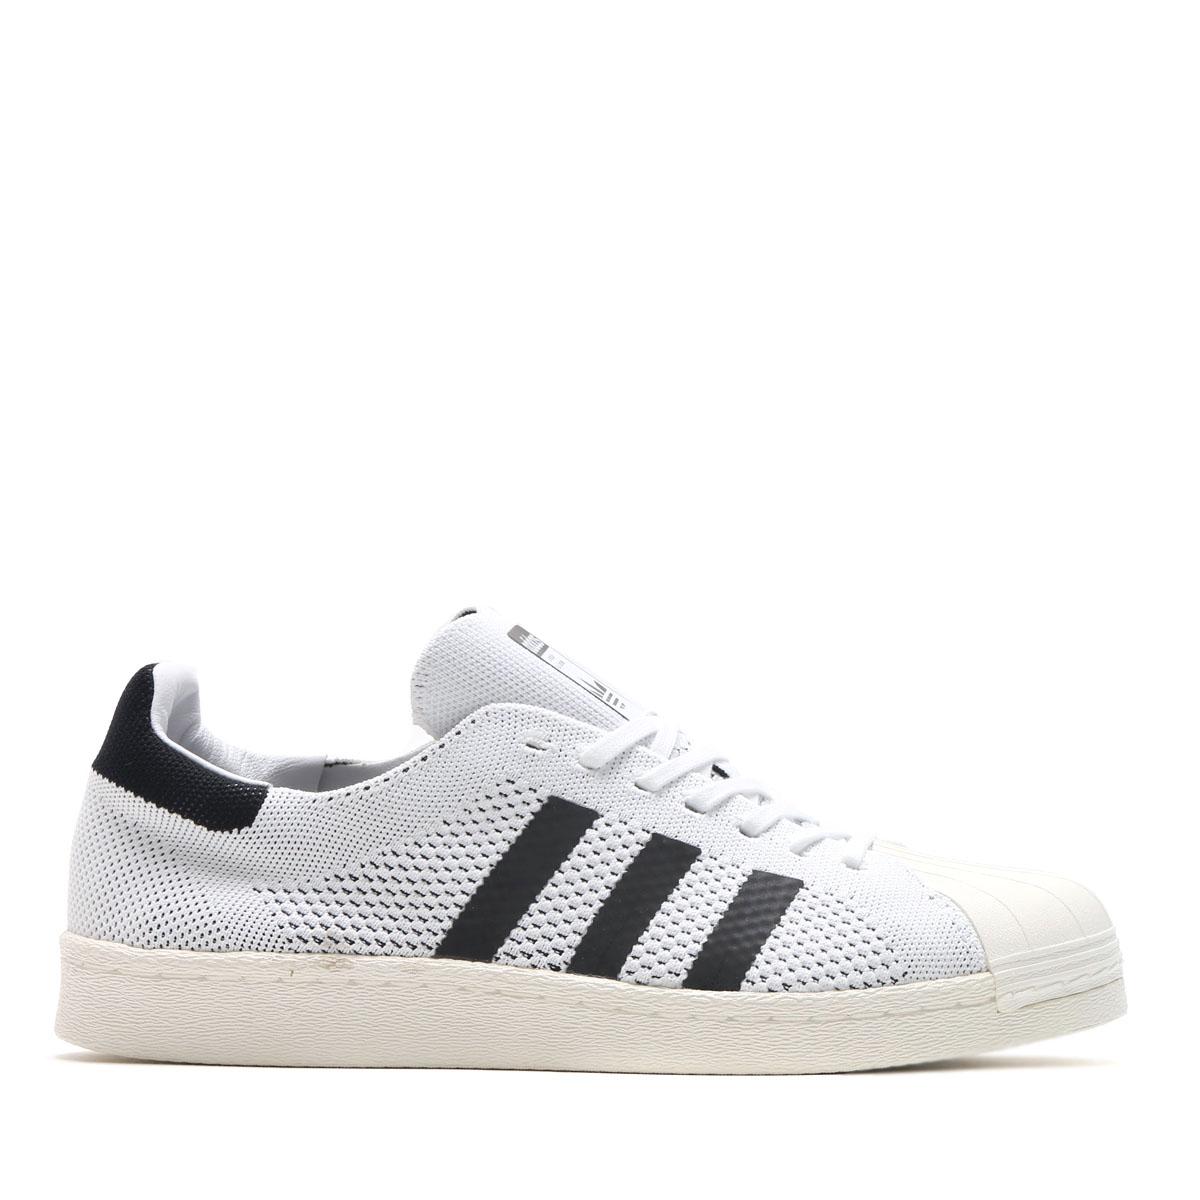 Originaux Adidas Boost Superstar Pk 1X0sL